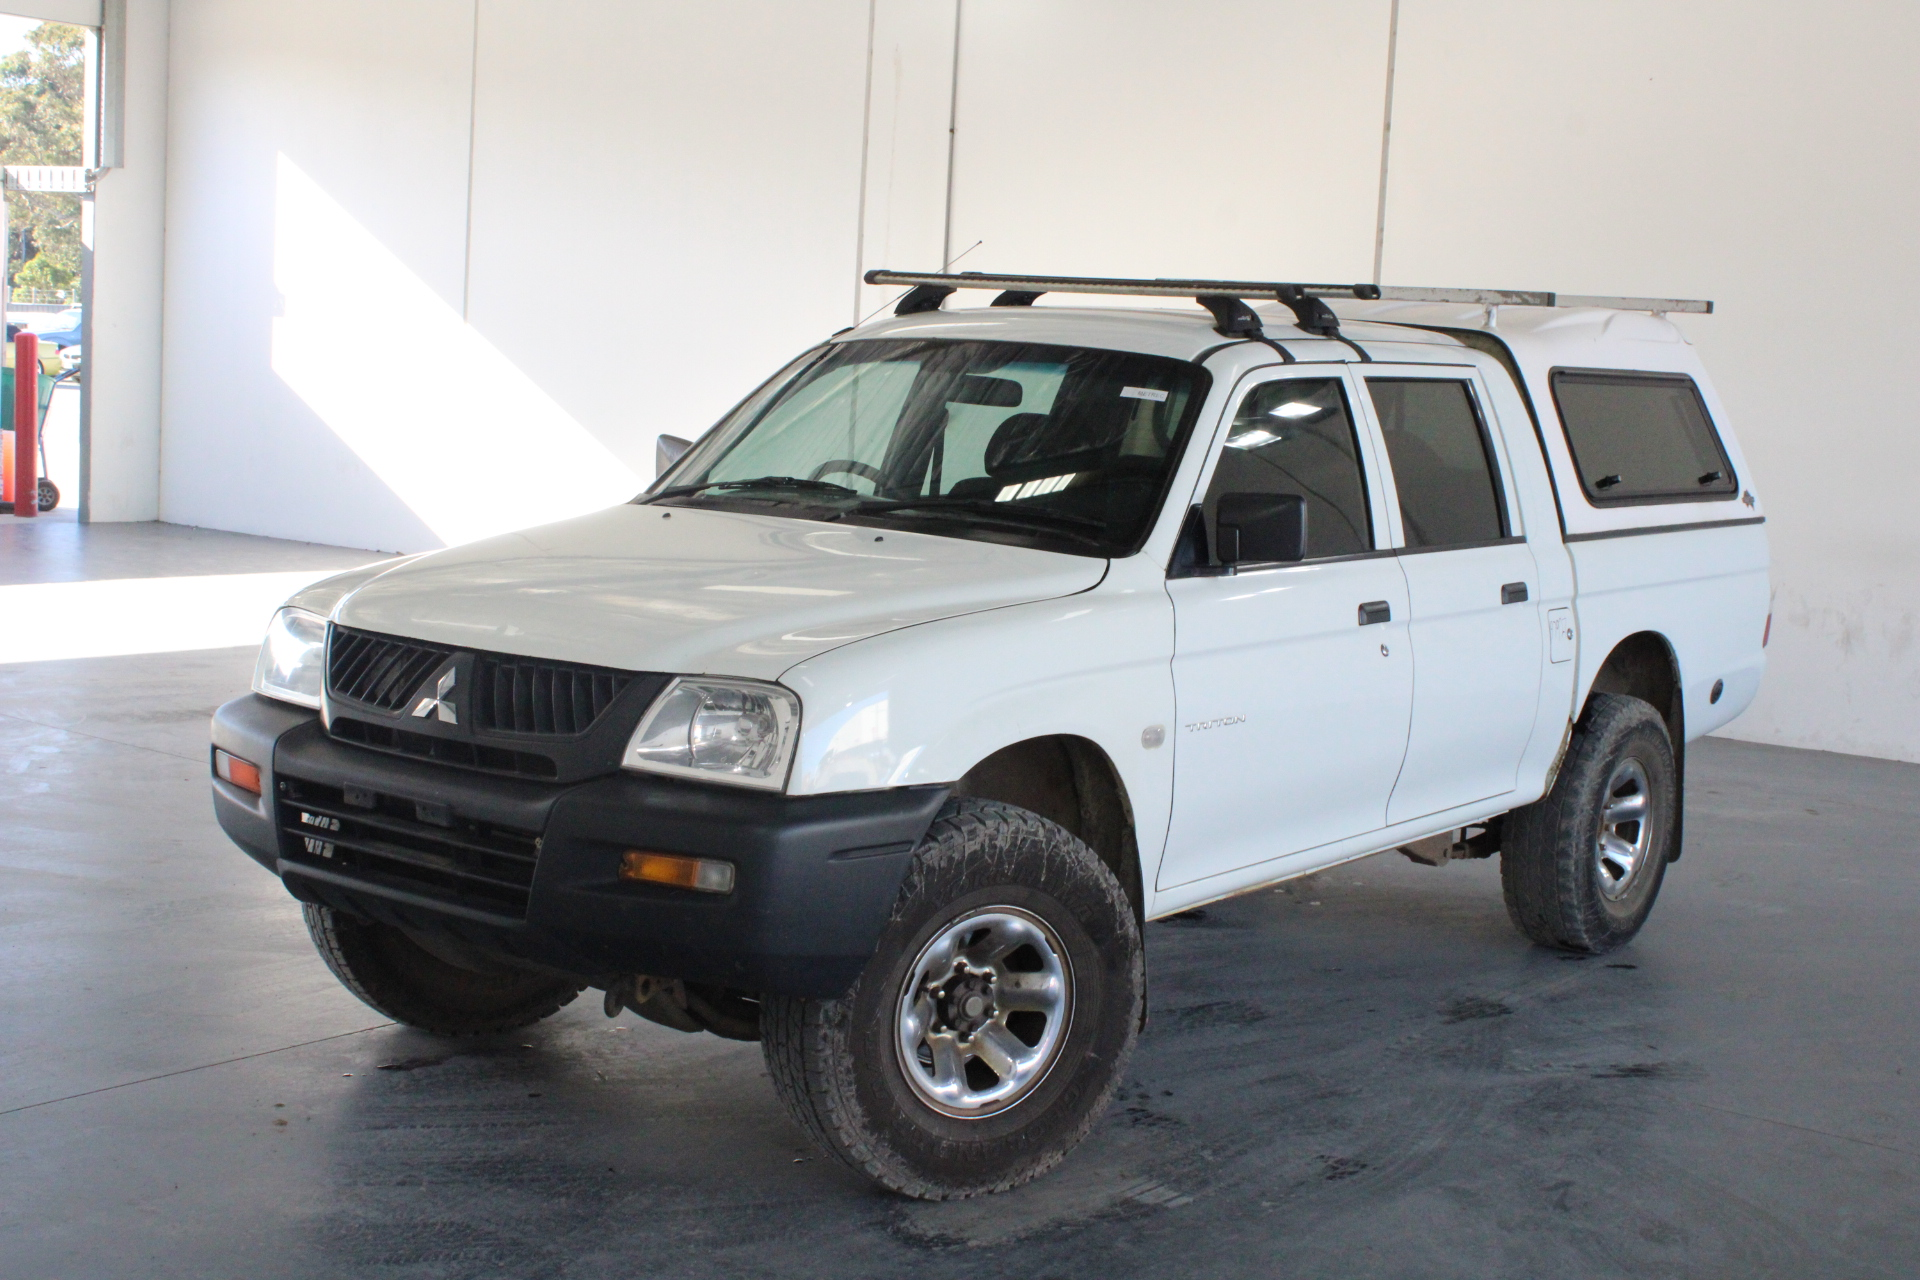 2005 Mitsubishi Triton GLX MK Manual Dual Cab (WOVR+Inspected)